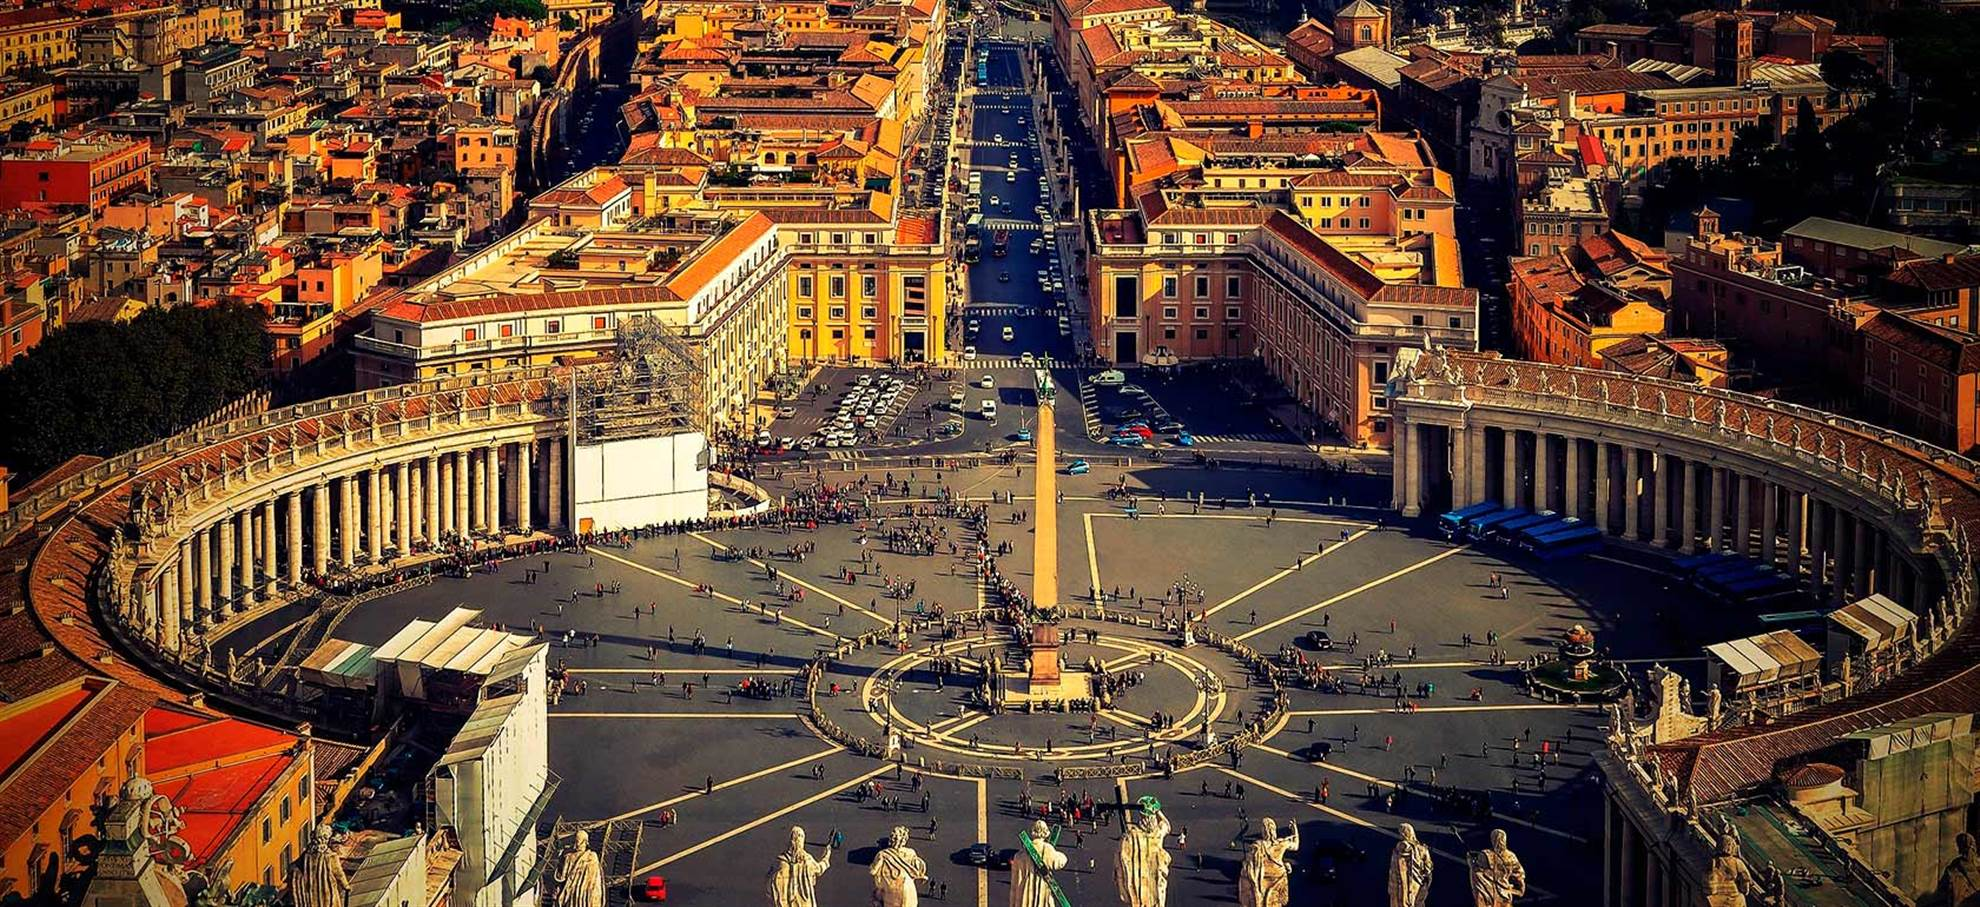 Musei Vaticani e Cappella Sistina salta la fila!